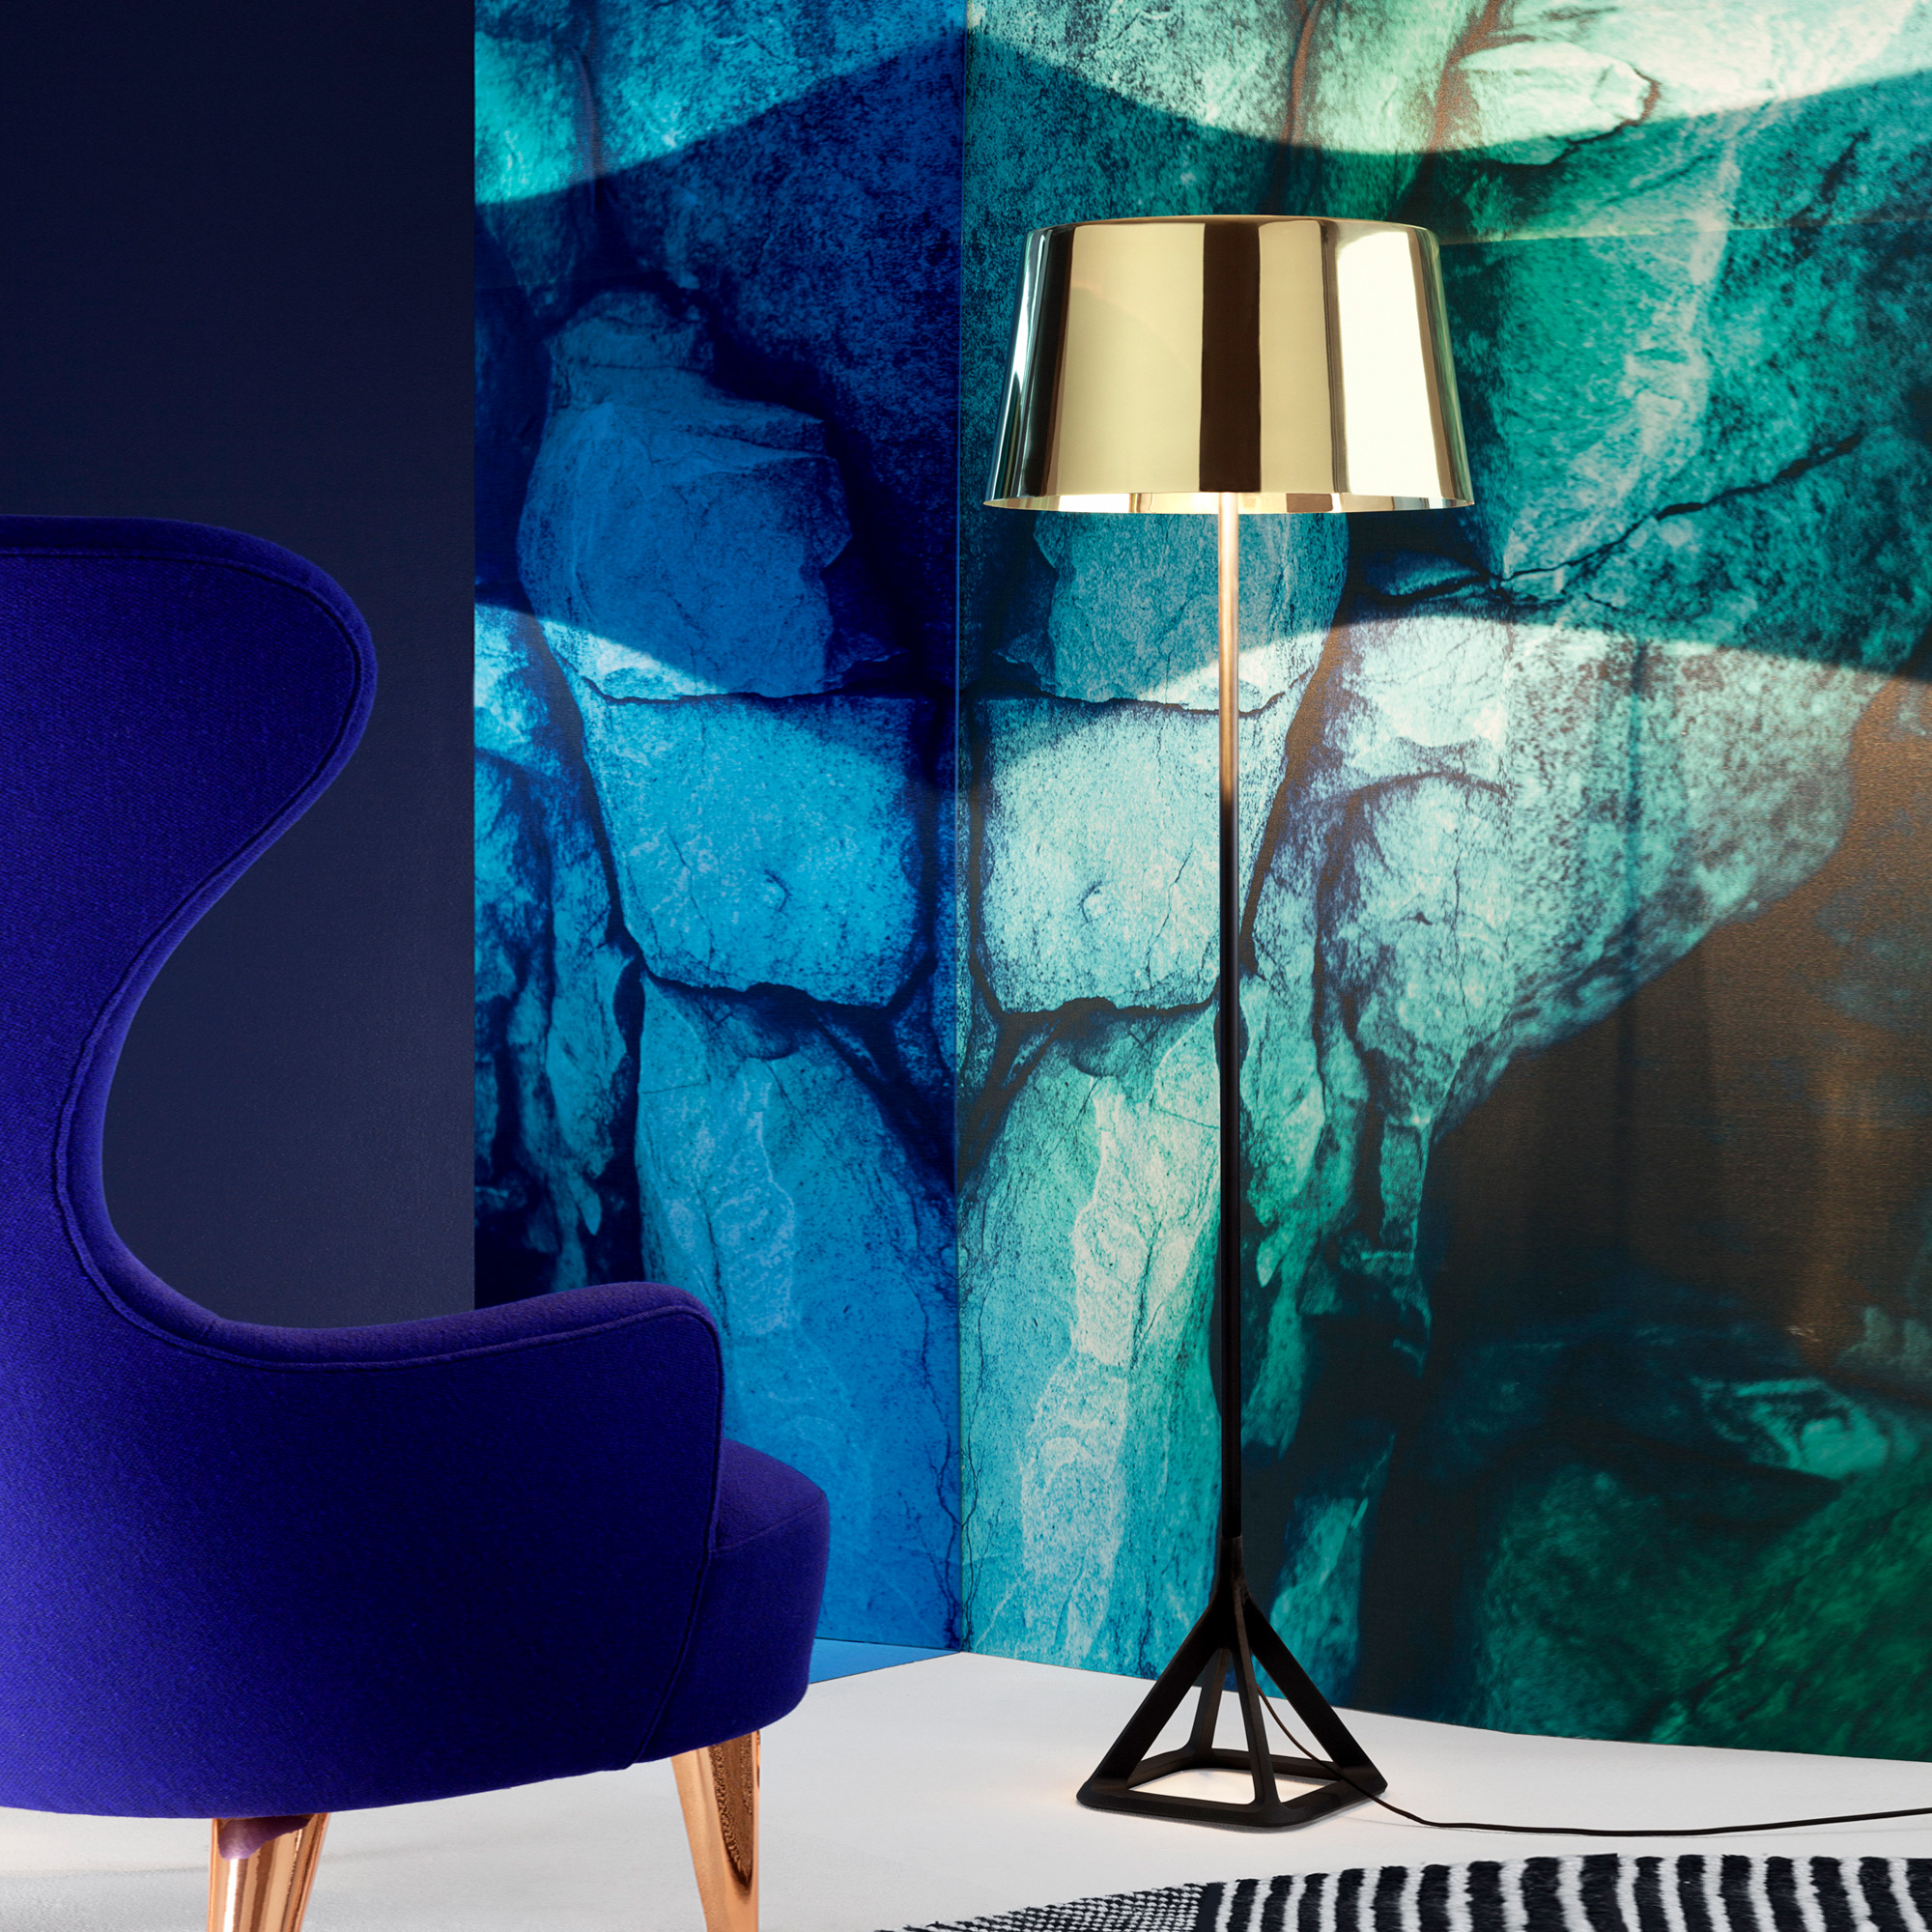 tom dixon base floor stehleuchte bss02pb feum reuter. Black Bedroom Furniture Sets. Home Design Ideas